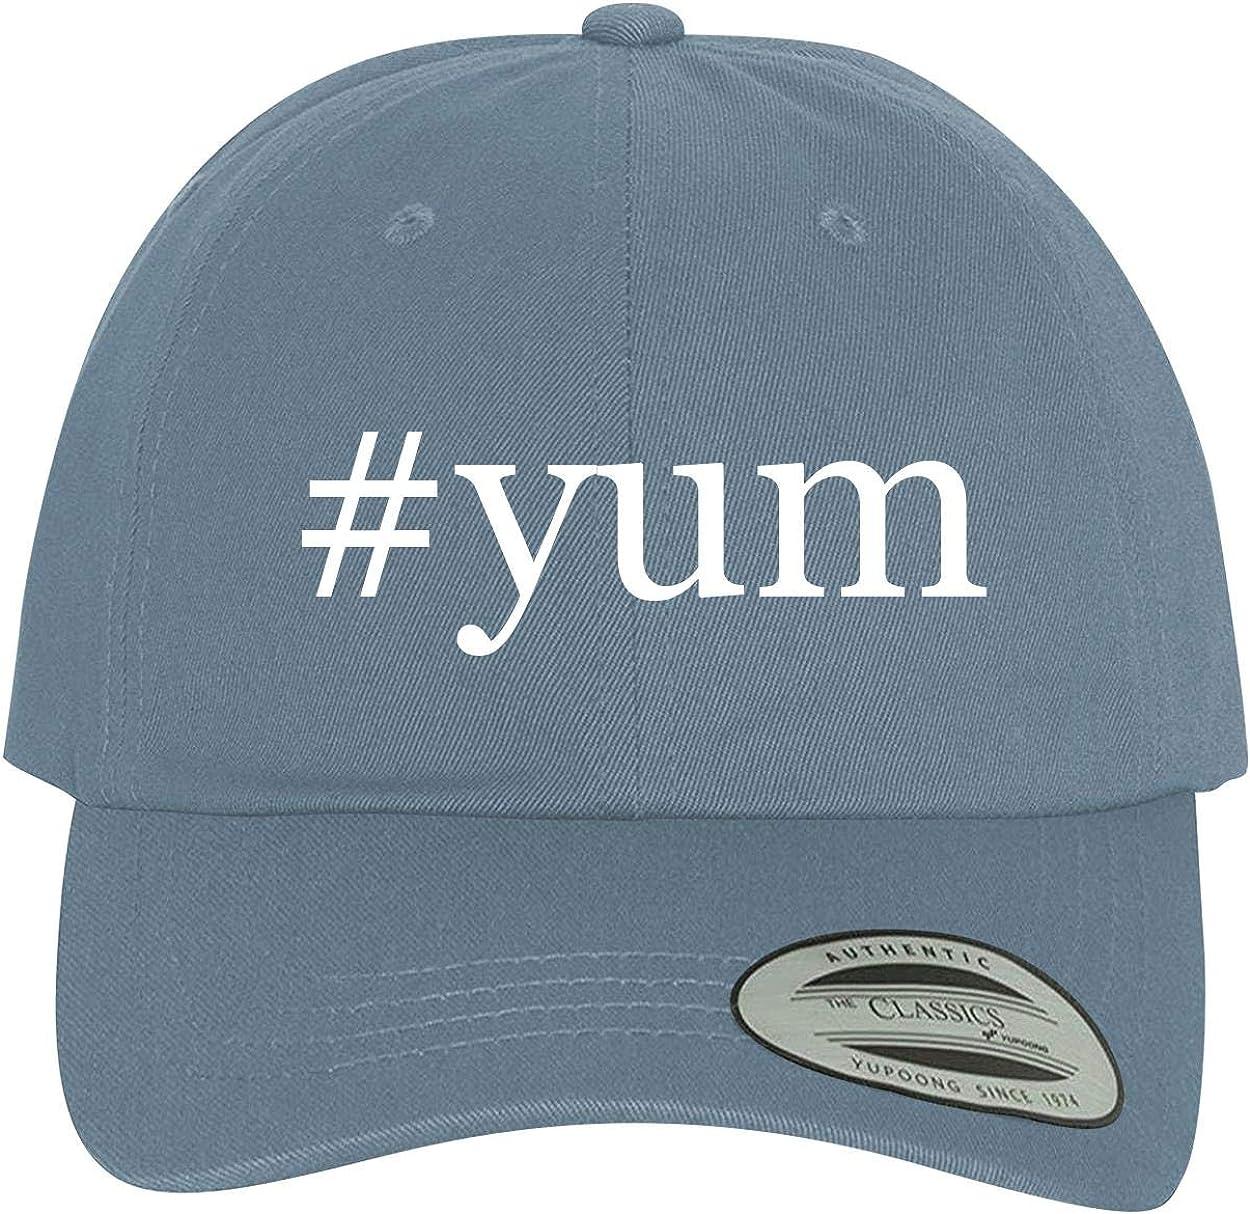 Comfortable Dad Hat Baseball Cap BH Cool Designs #yum